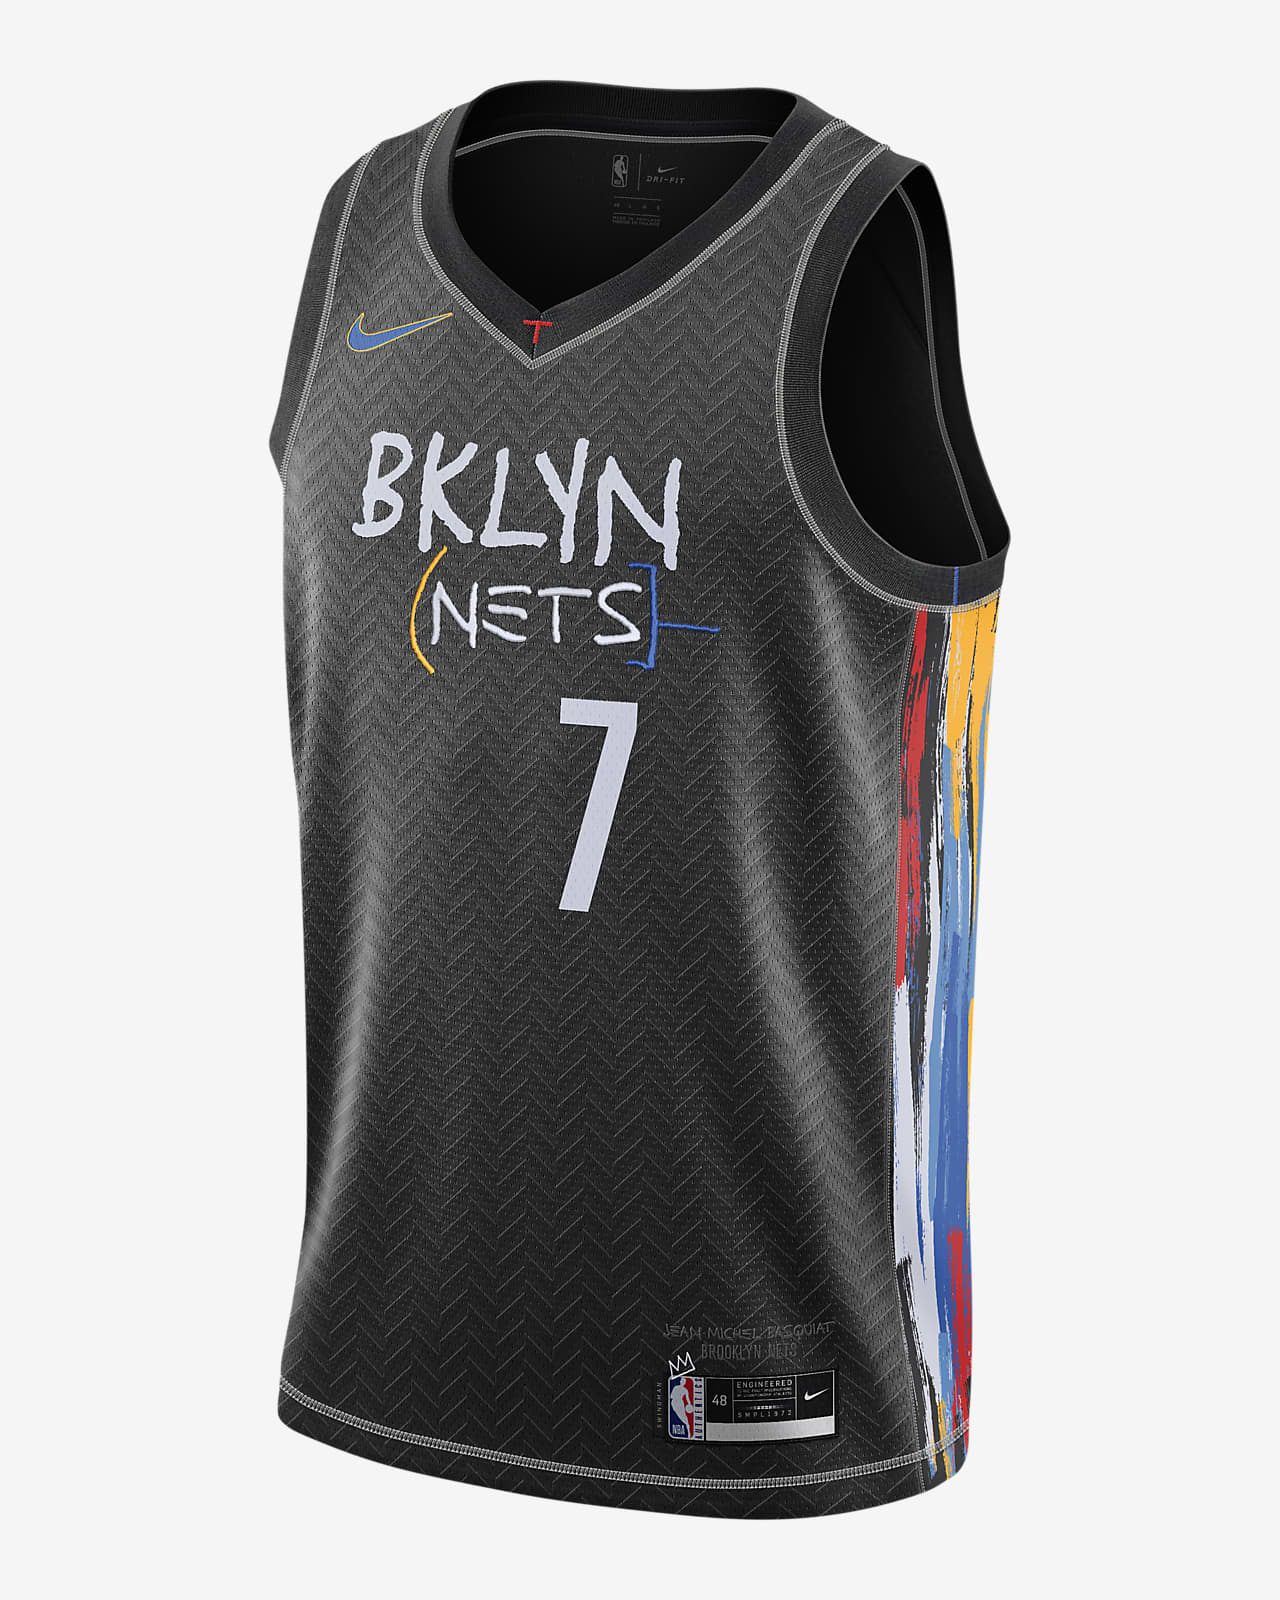 Camisola NBA da Nike Swingman Brooklyn Nets City Edition